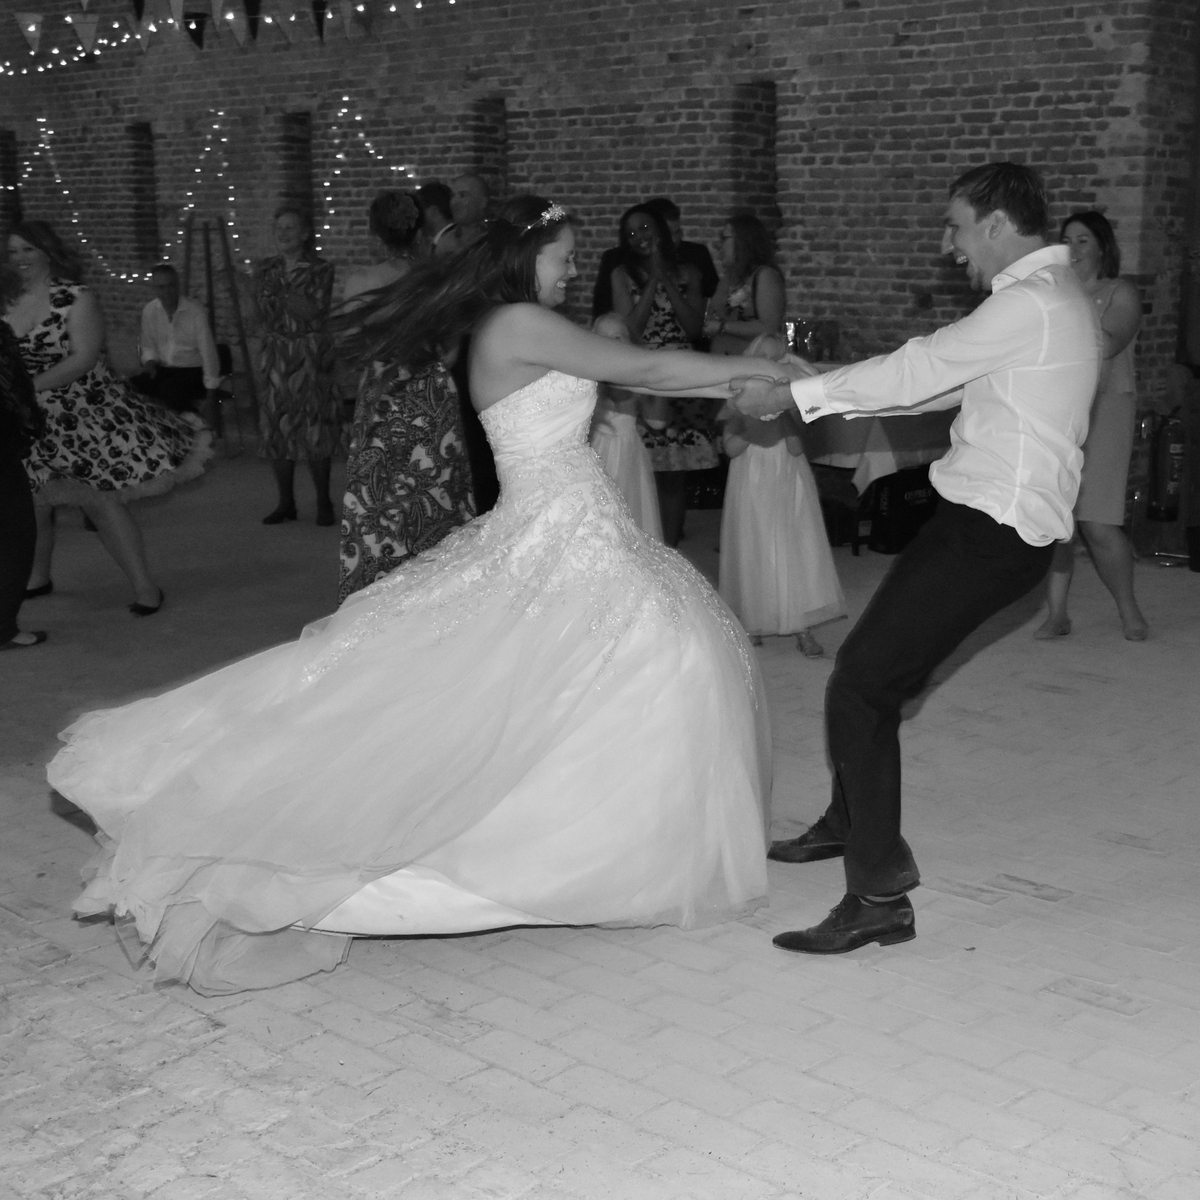 Hampshire Wedding Photography - 2015 highlights 011